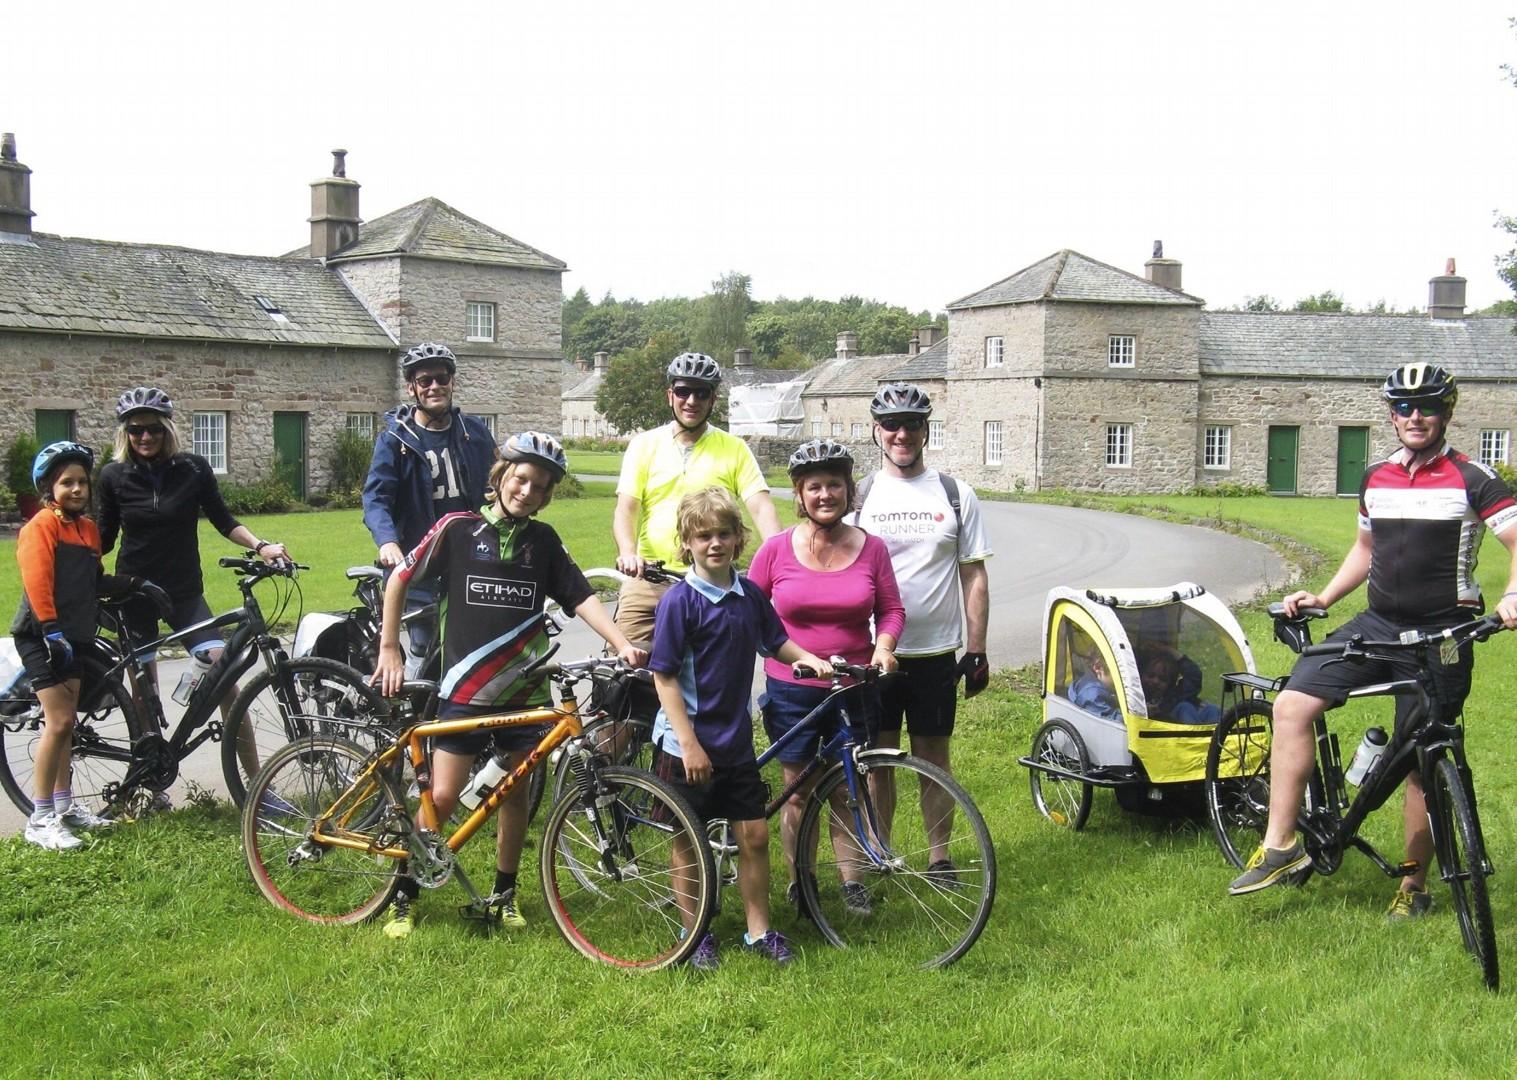 guided-group-family-bike-skills-uk.jpg - UK - Lake District - Bike Skills - Family Cycling